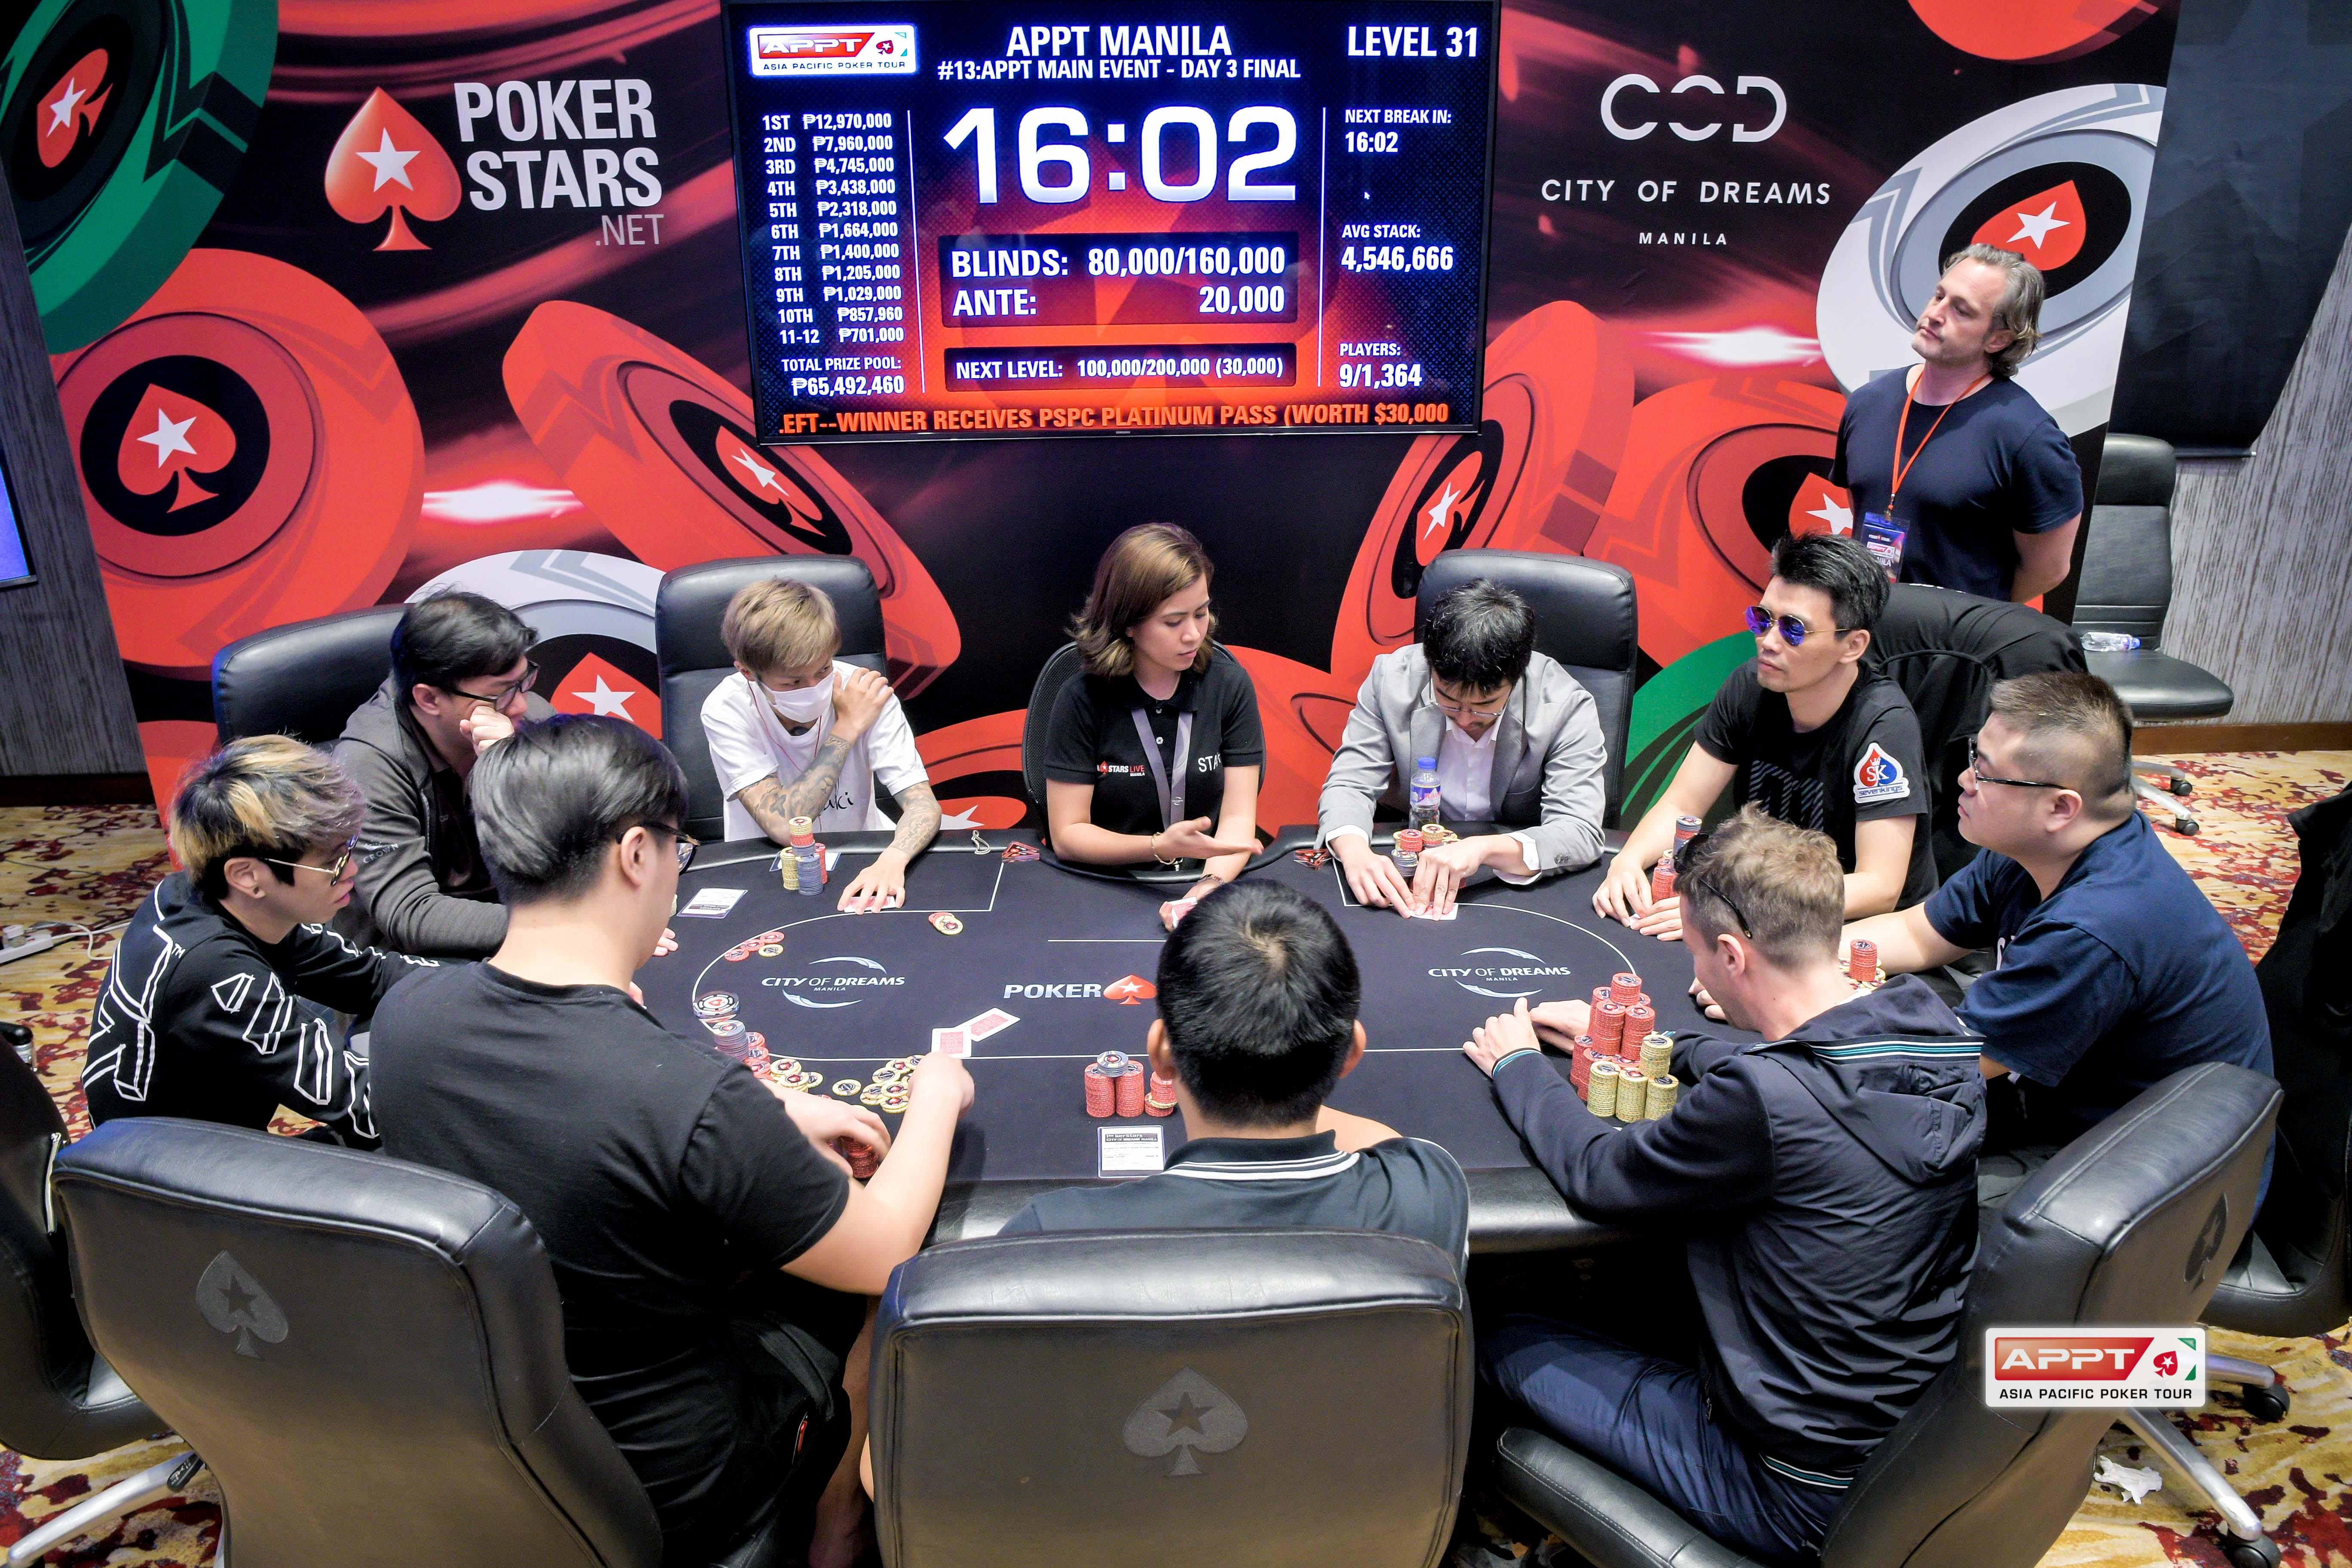 Manila poker betting limits online betting and gambling games